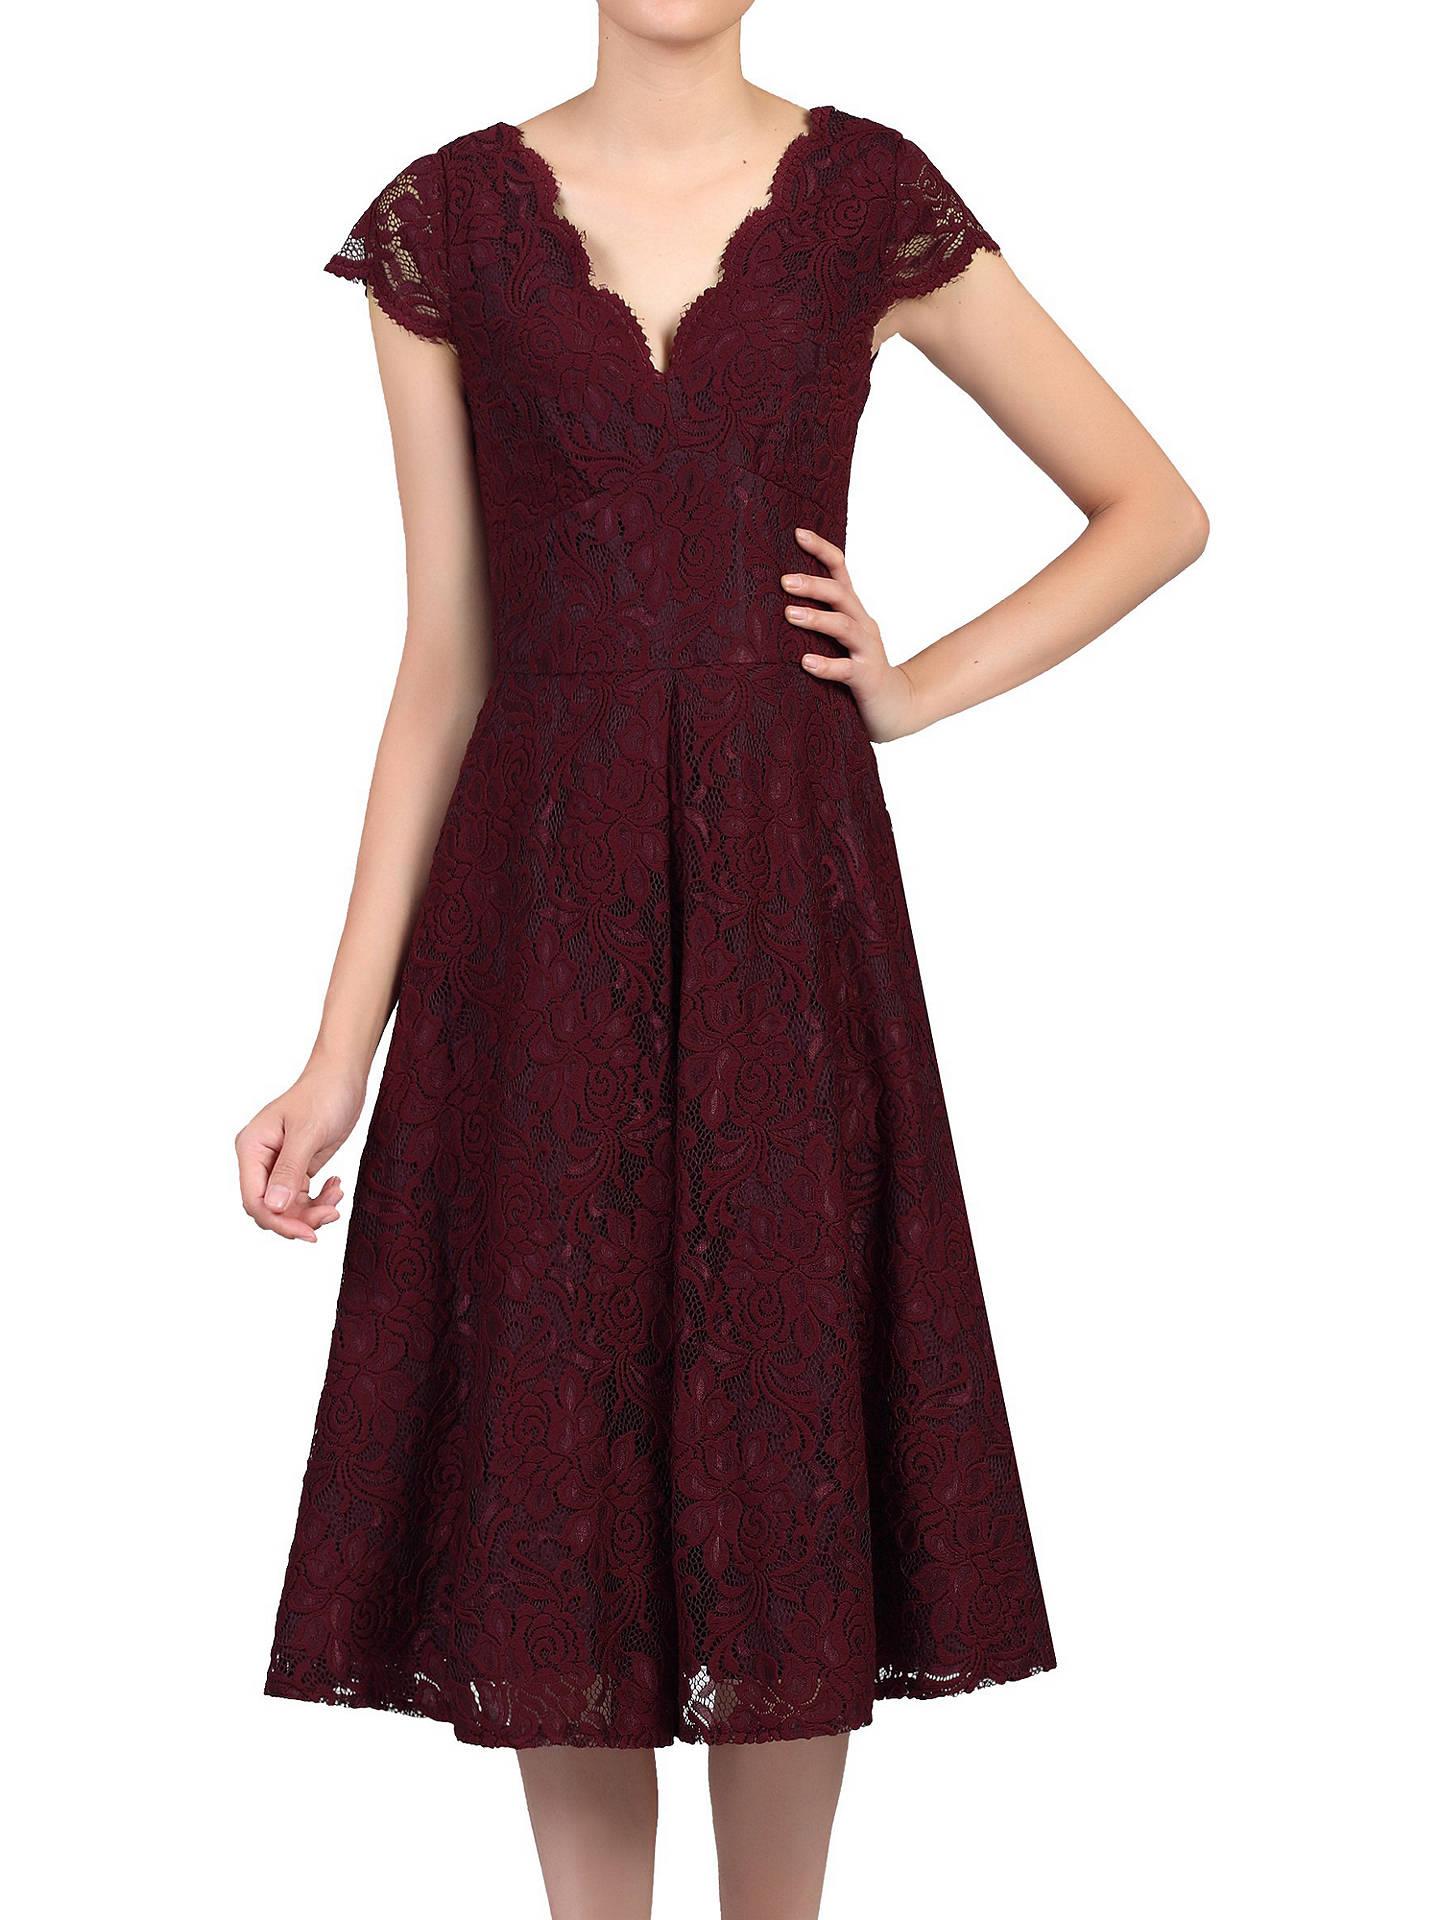 fdd5e47ddf2f Jolie Moi Cap Sleeve Lace Prom Dress at John Lewis   Partners